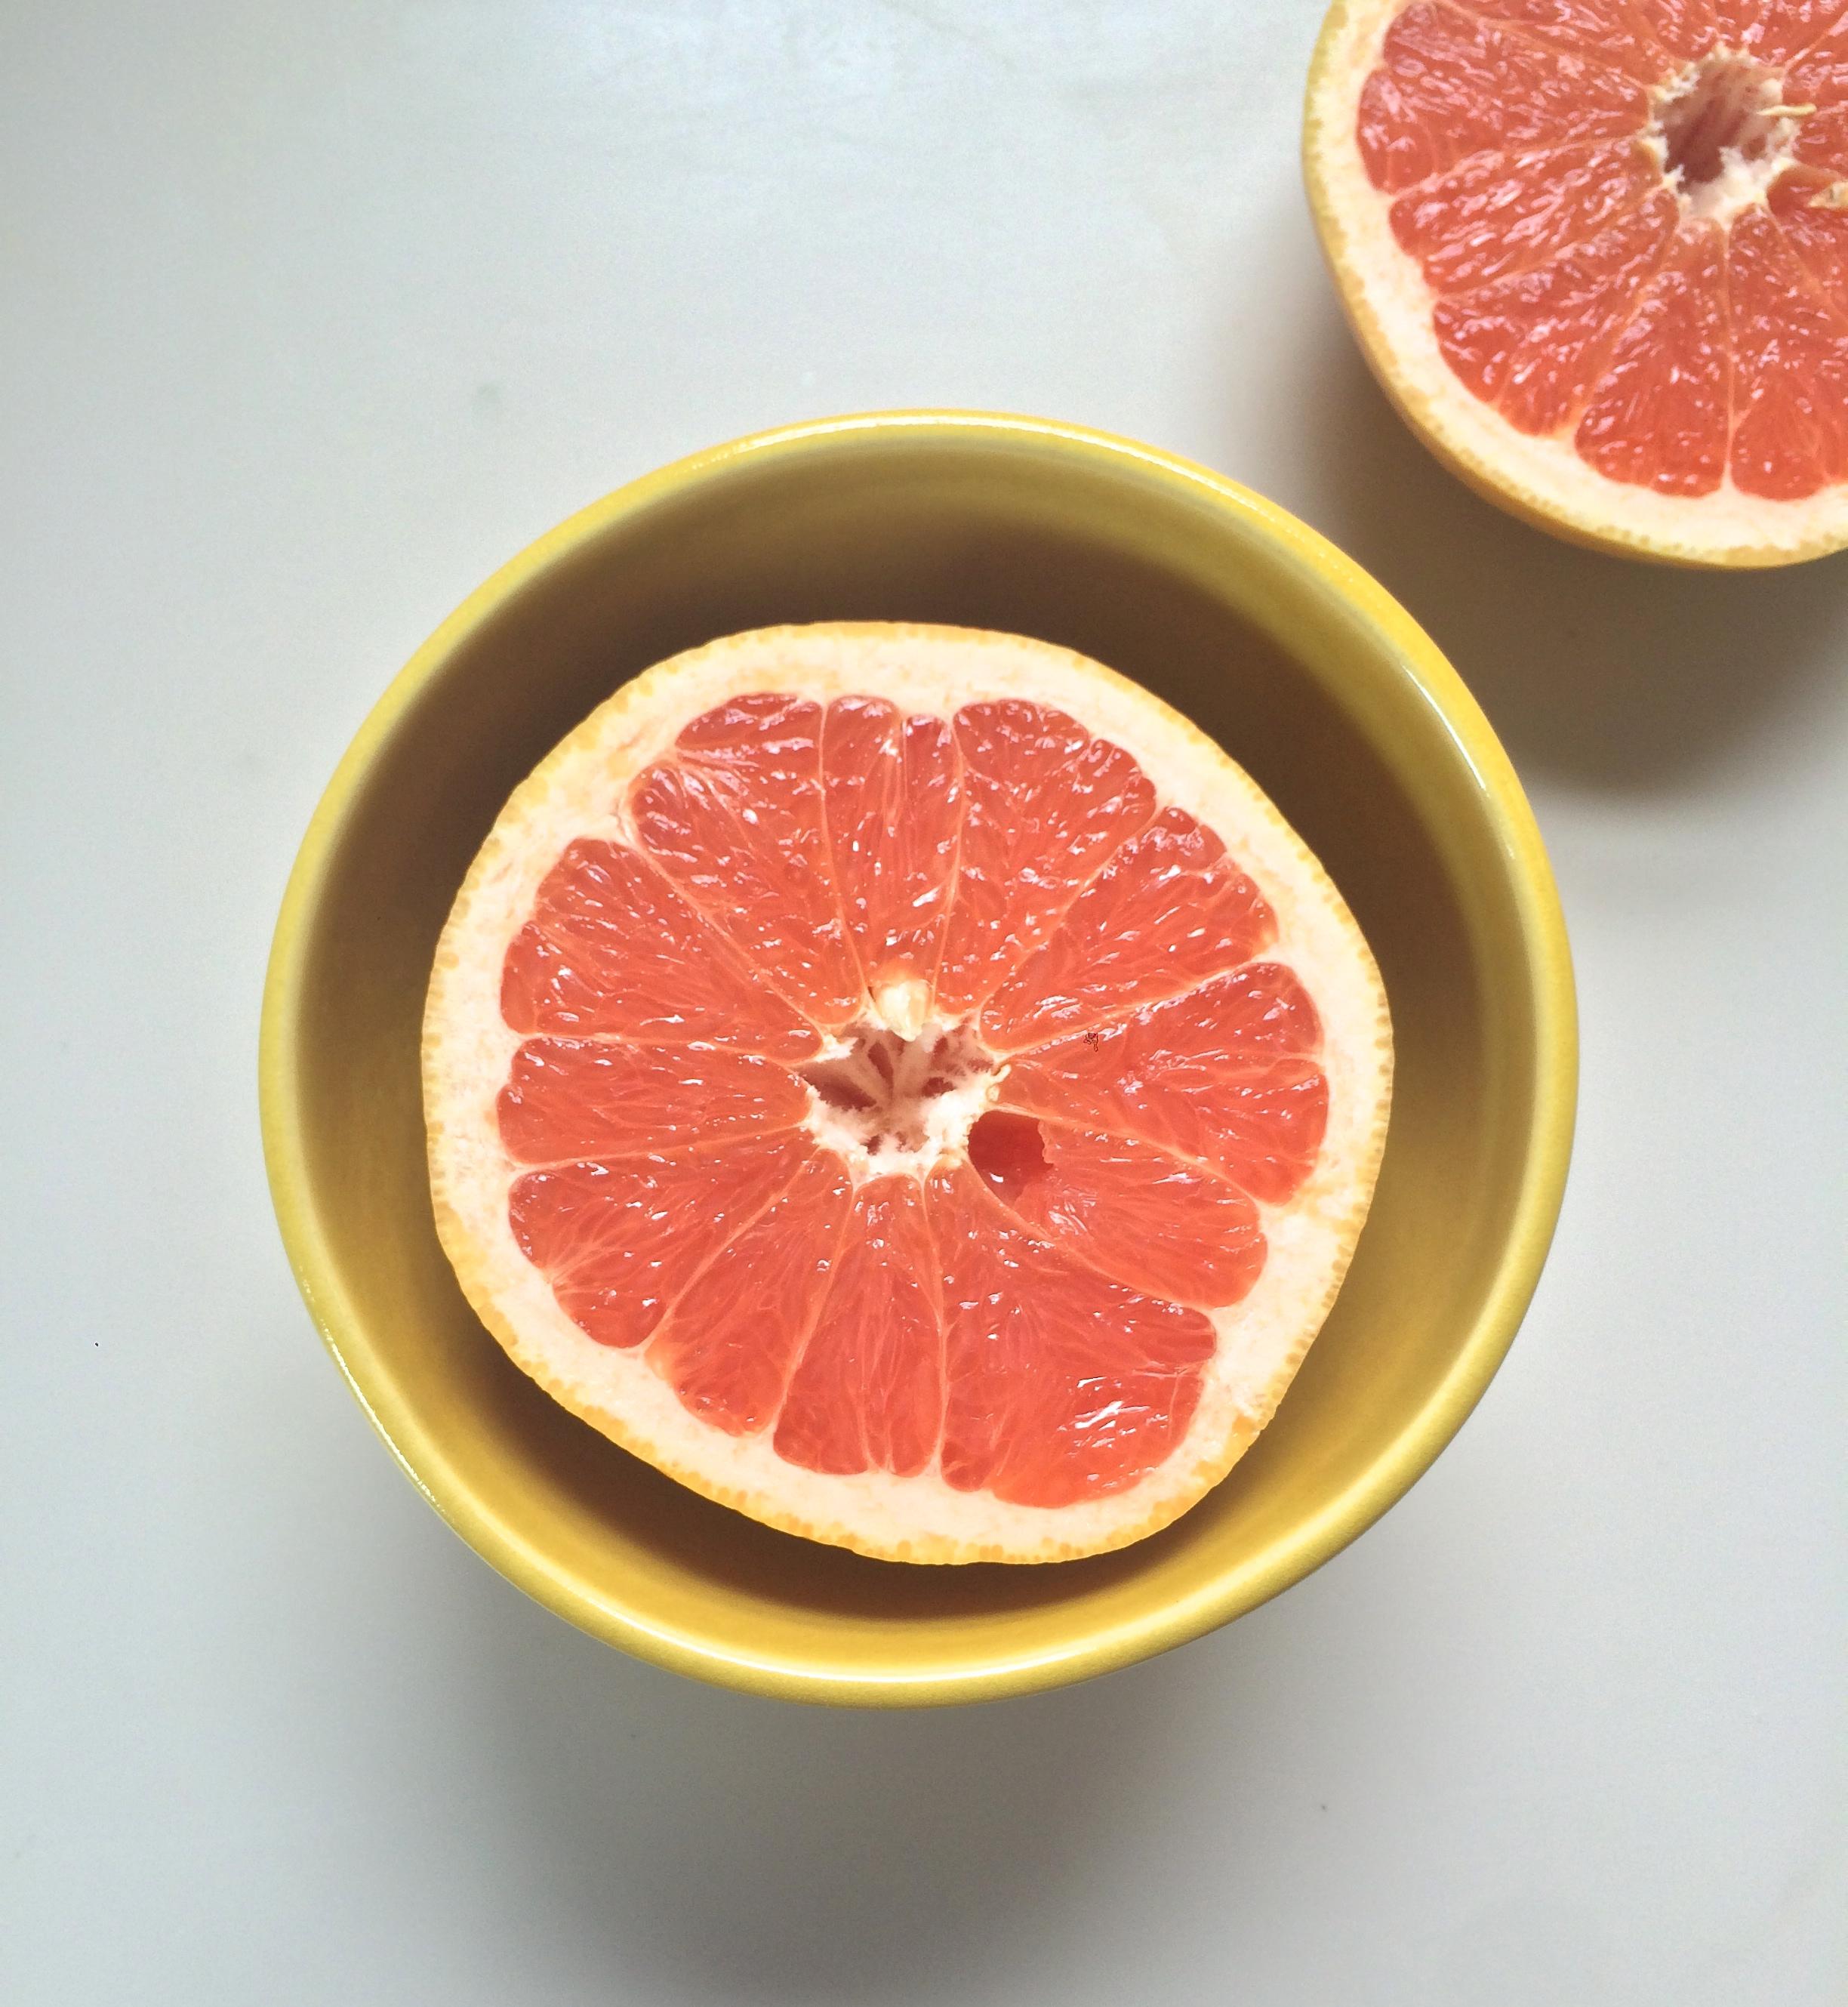 Grapefruit sliced in half. If I'm feeling like I need a bit of a sugar boost, I'll sprinkle a couple teaspoons of sugar on top.